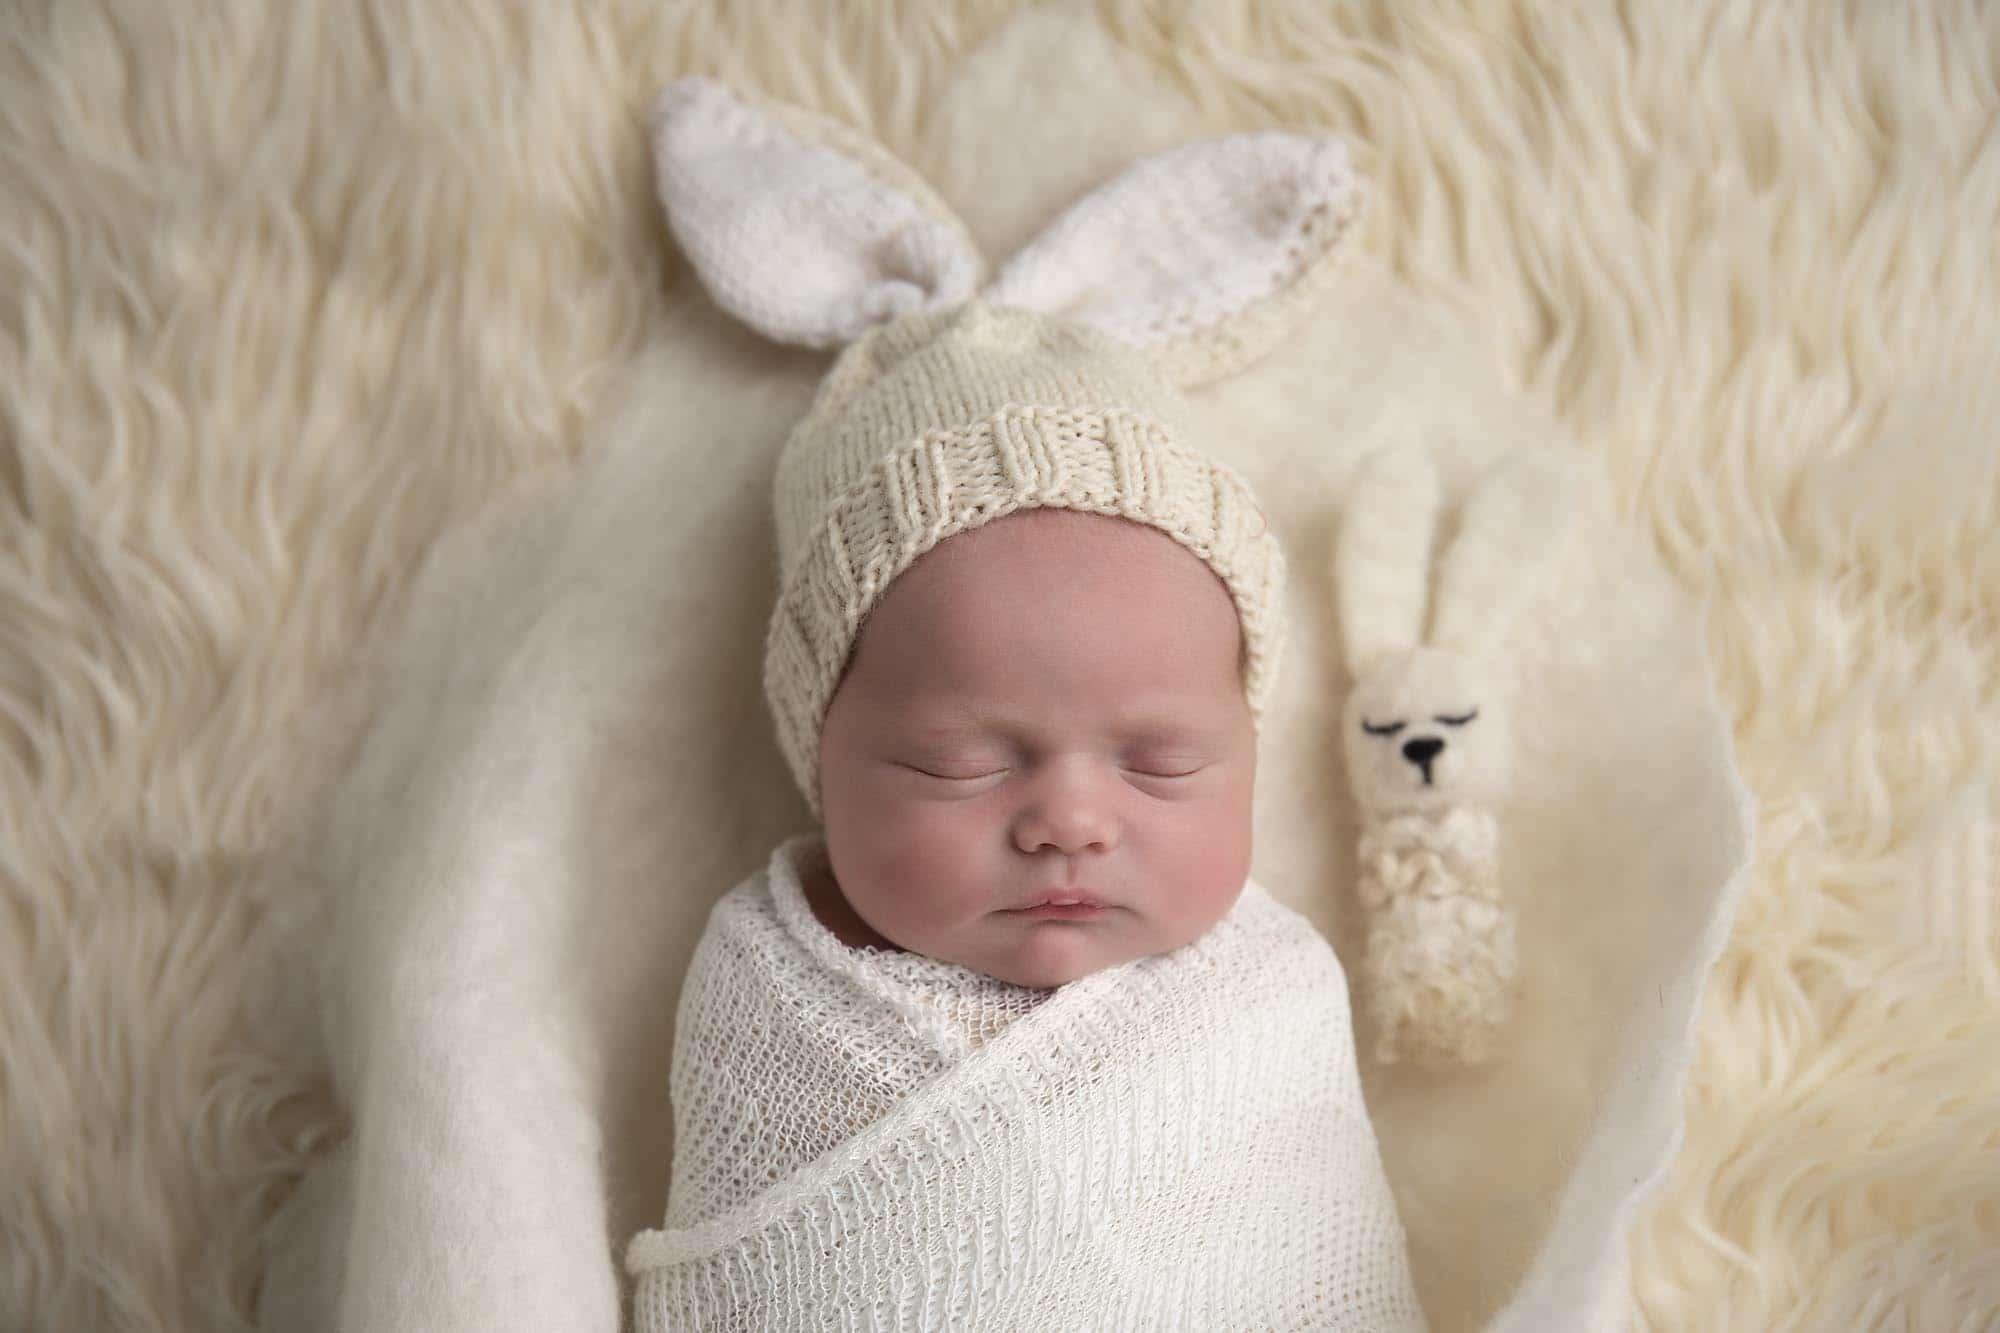 newborn girl in white bunny hat photographed by Newborn Photographer Cheshire